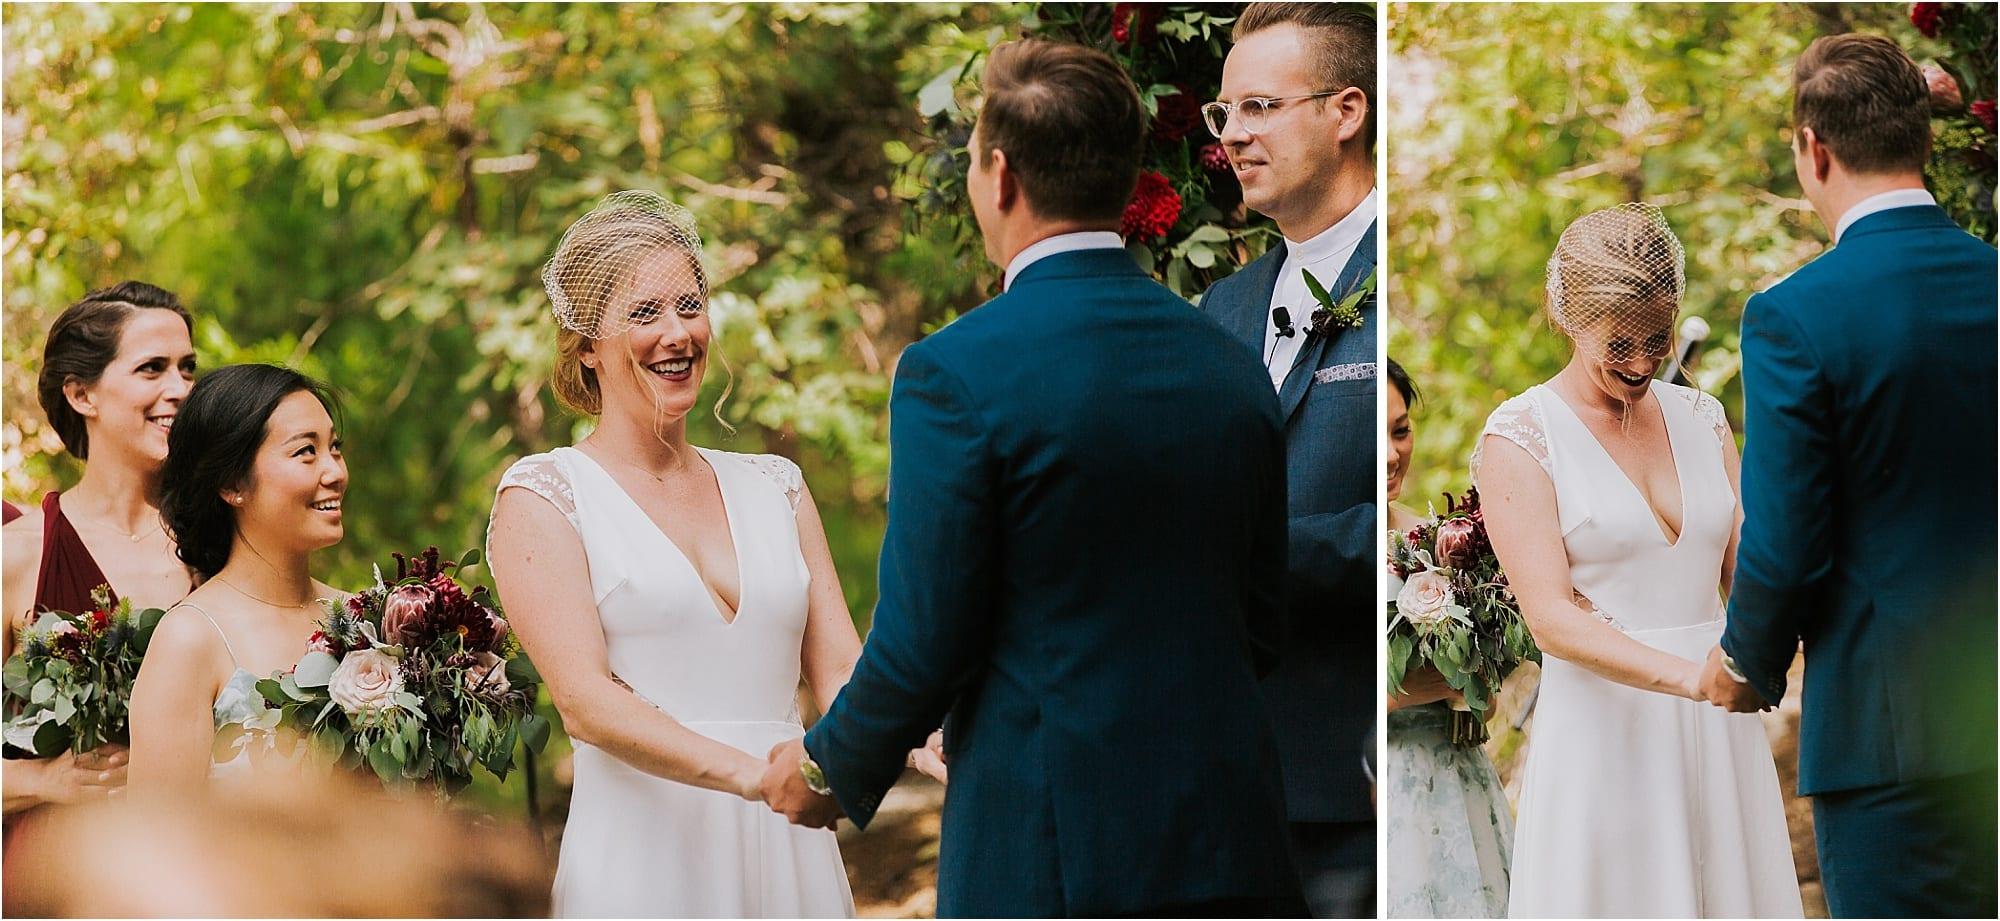 Evergreen Lodge Yosemite outdoor wedding ceremony